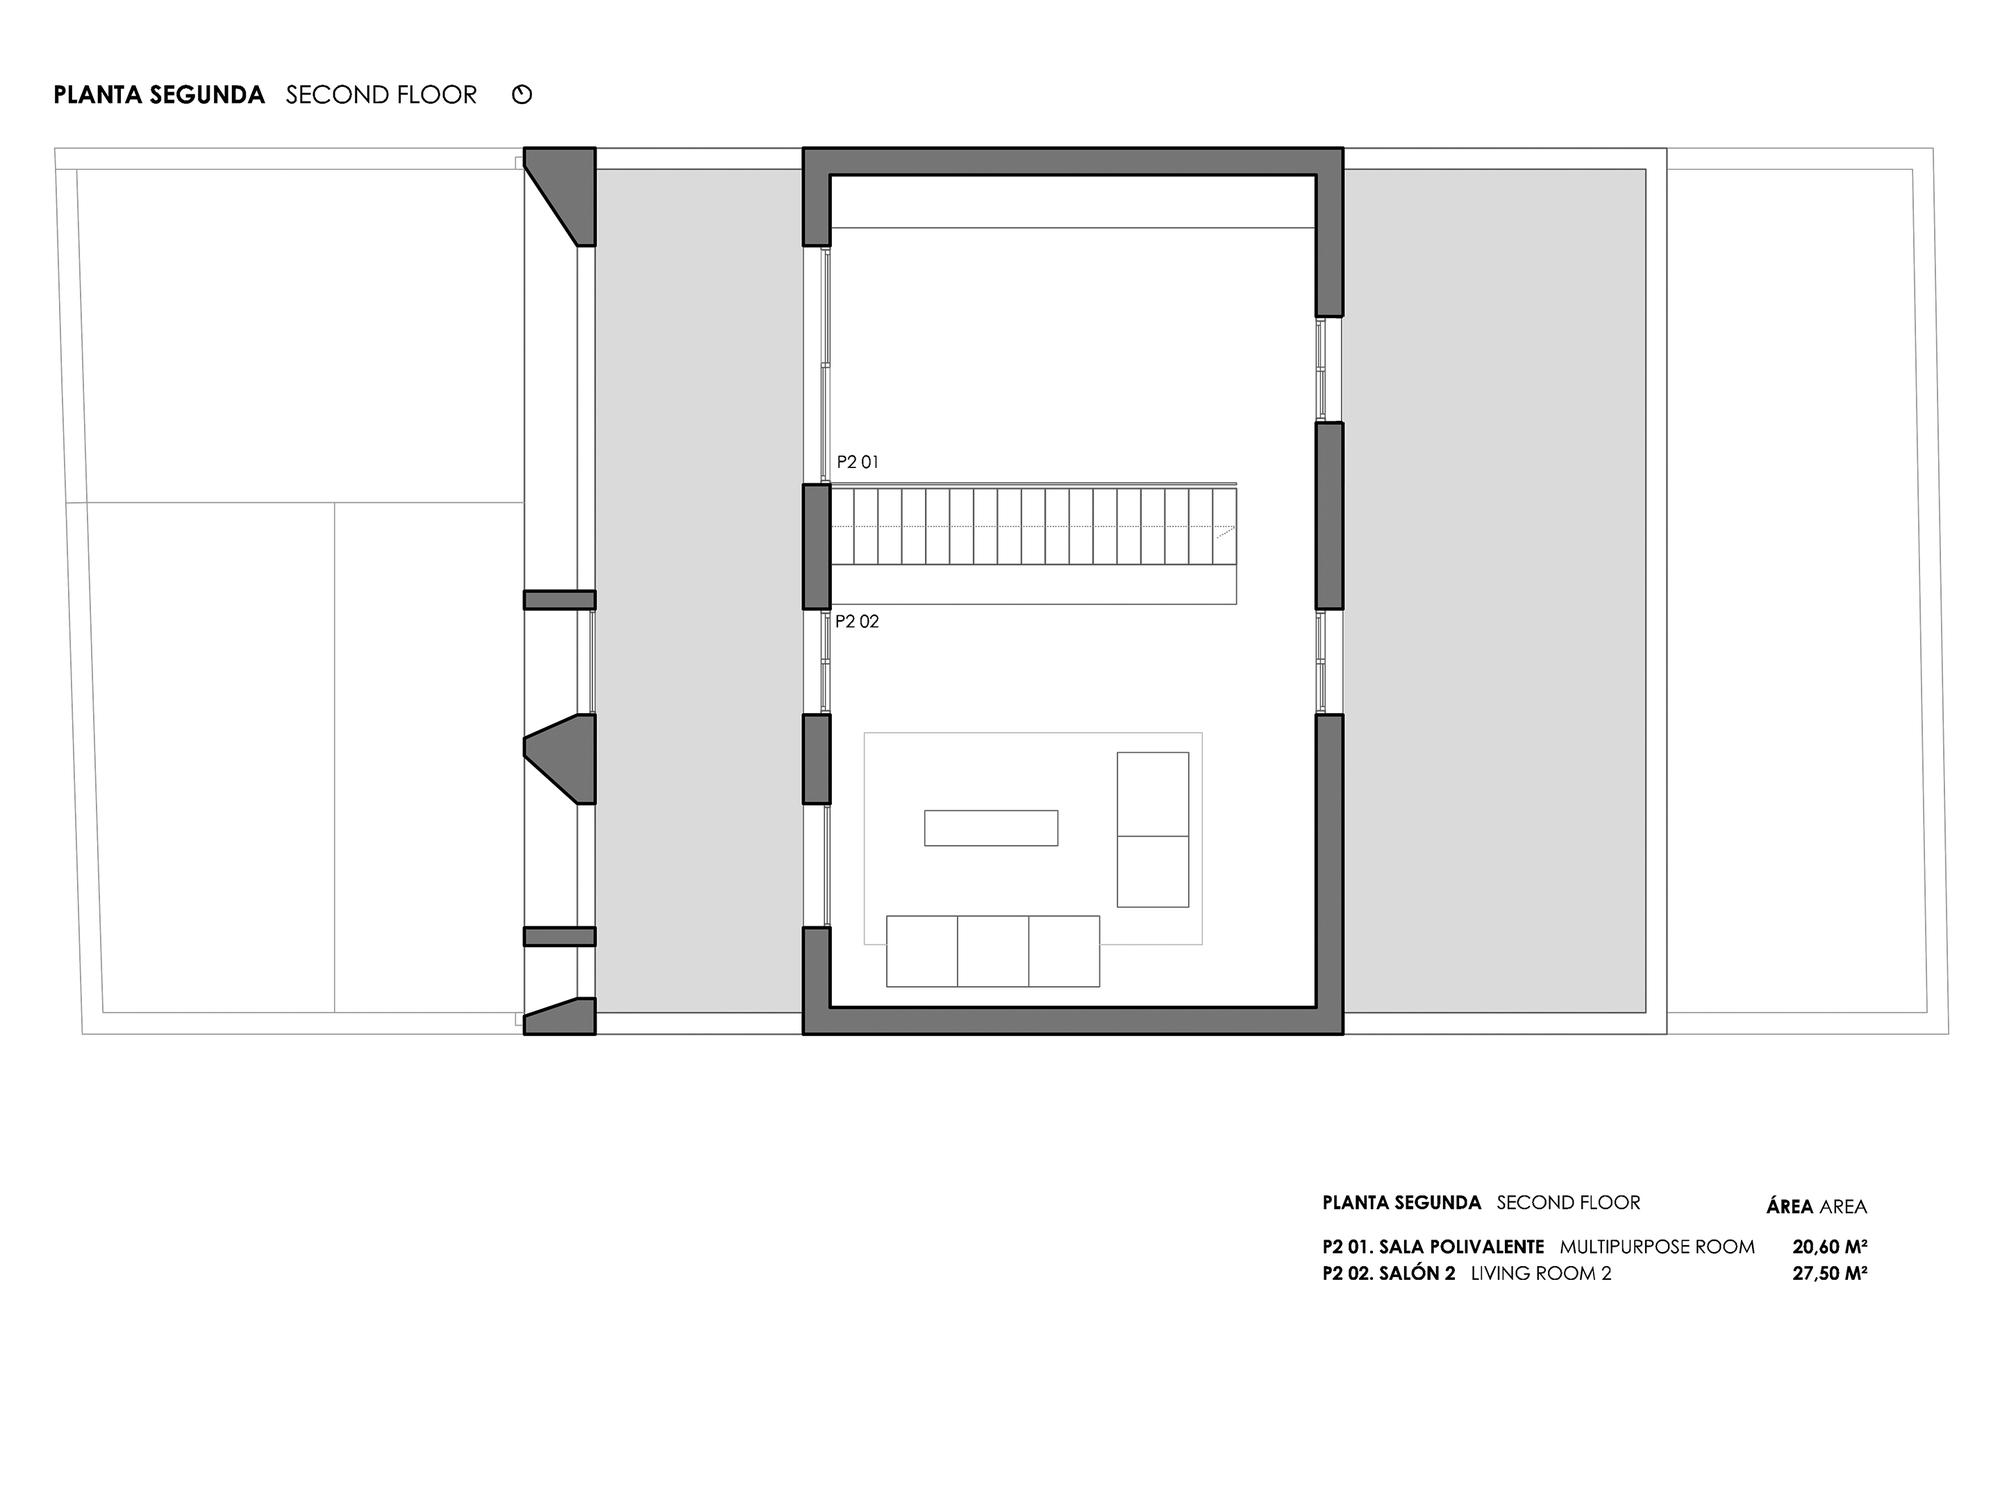 Gallery of brise soleil house rub n muedra estudio de for Plan estudios arquitectura